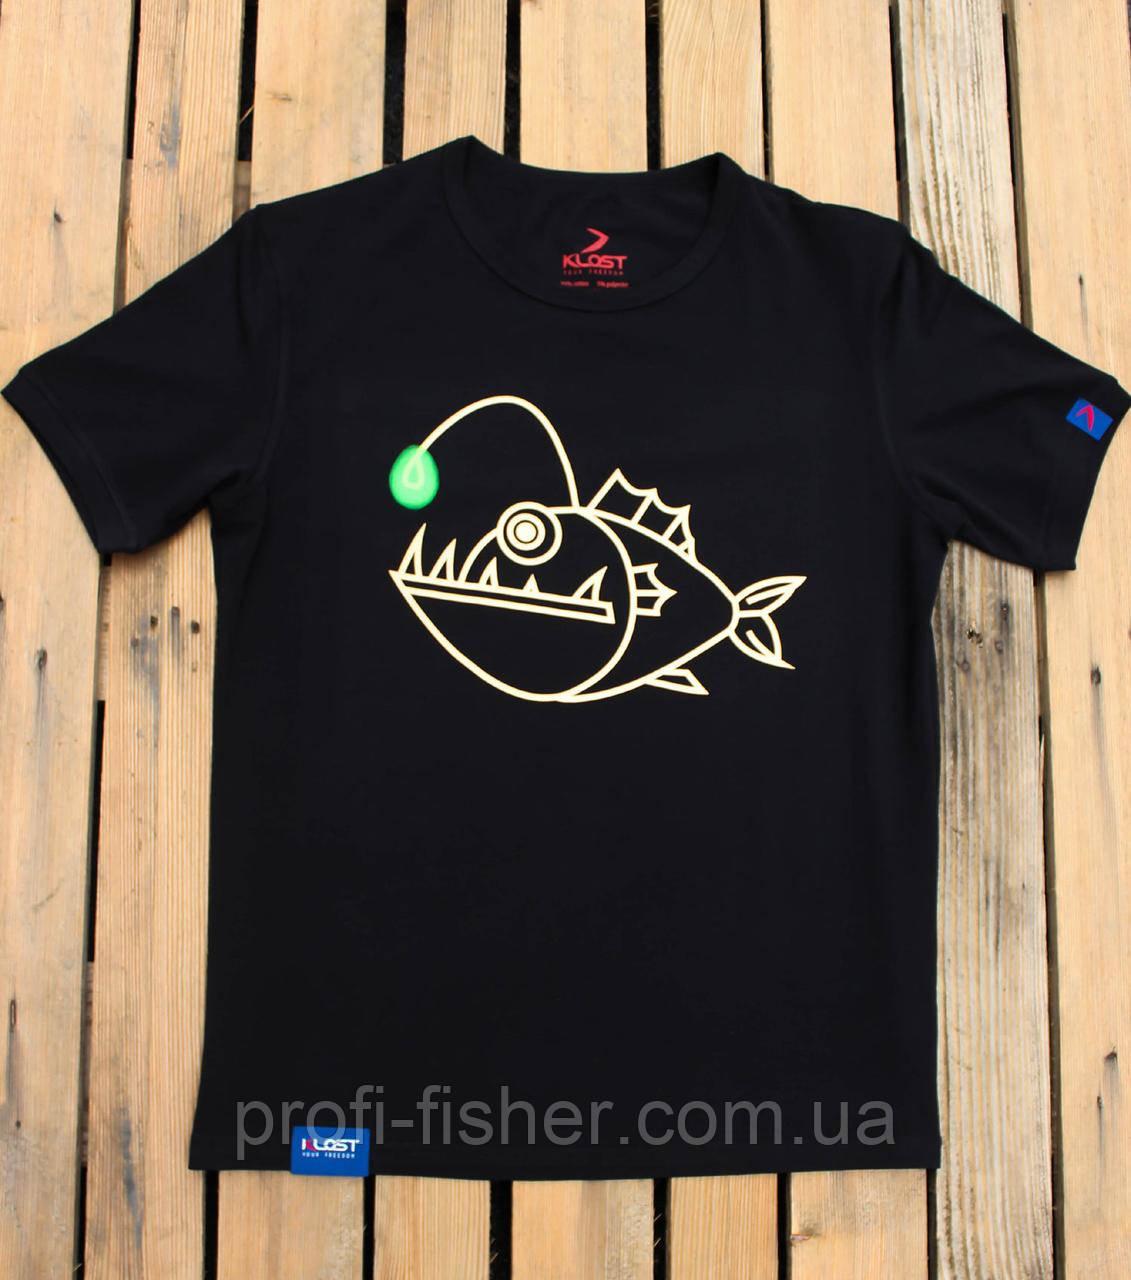 Футболка KLOST Angler Fish 70.01 L Black